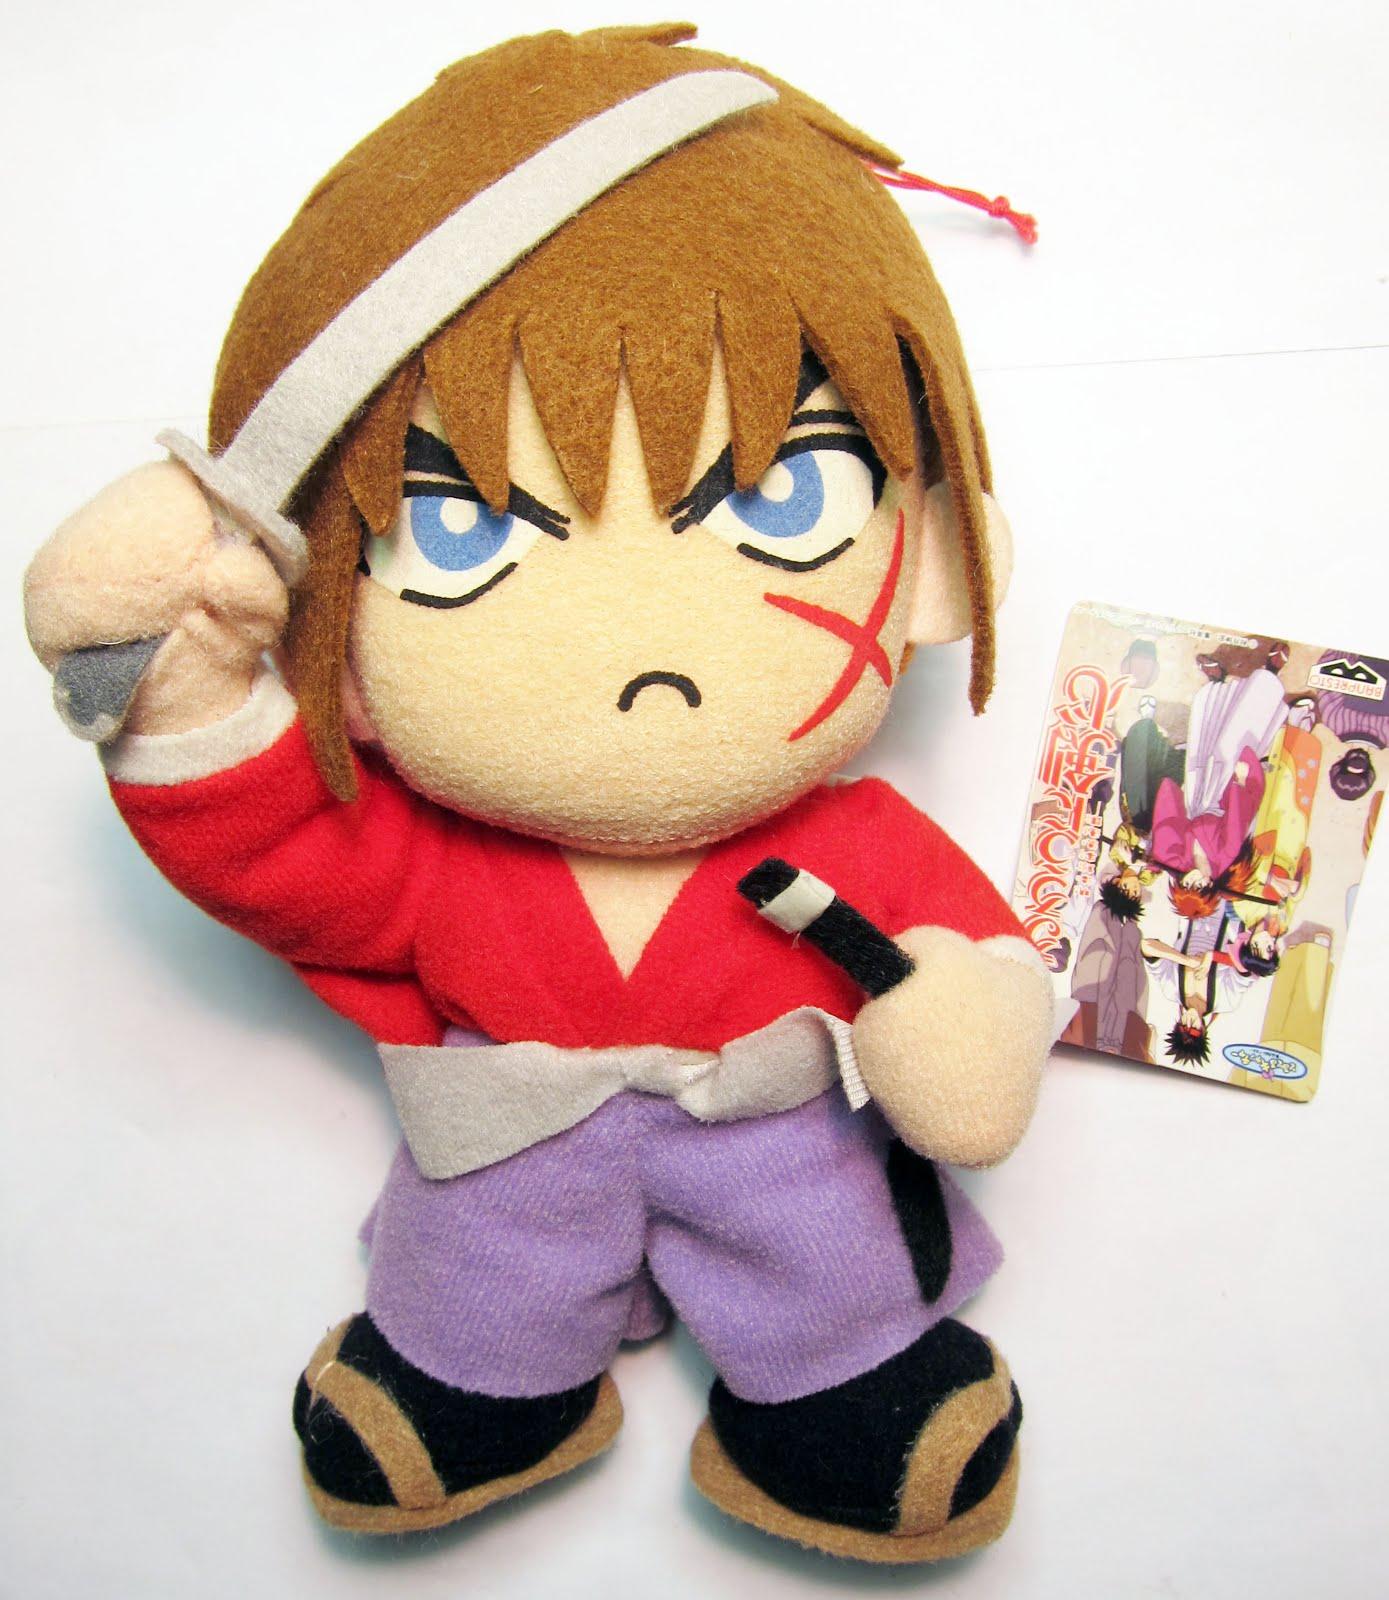 Rurouni Kenshin Season 1: Jesssellsherstuff: Rurouni Kenshin Series 1 Plush